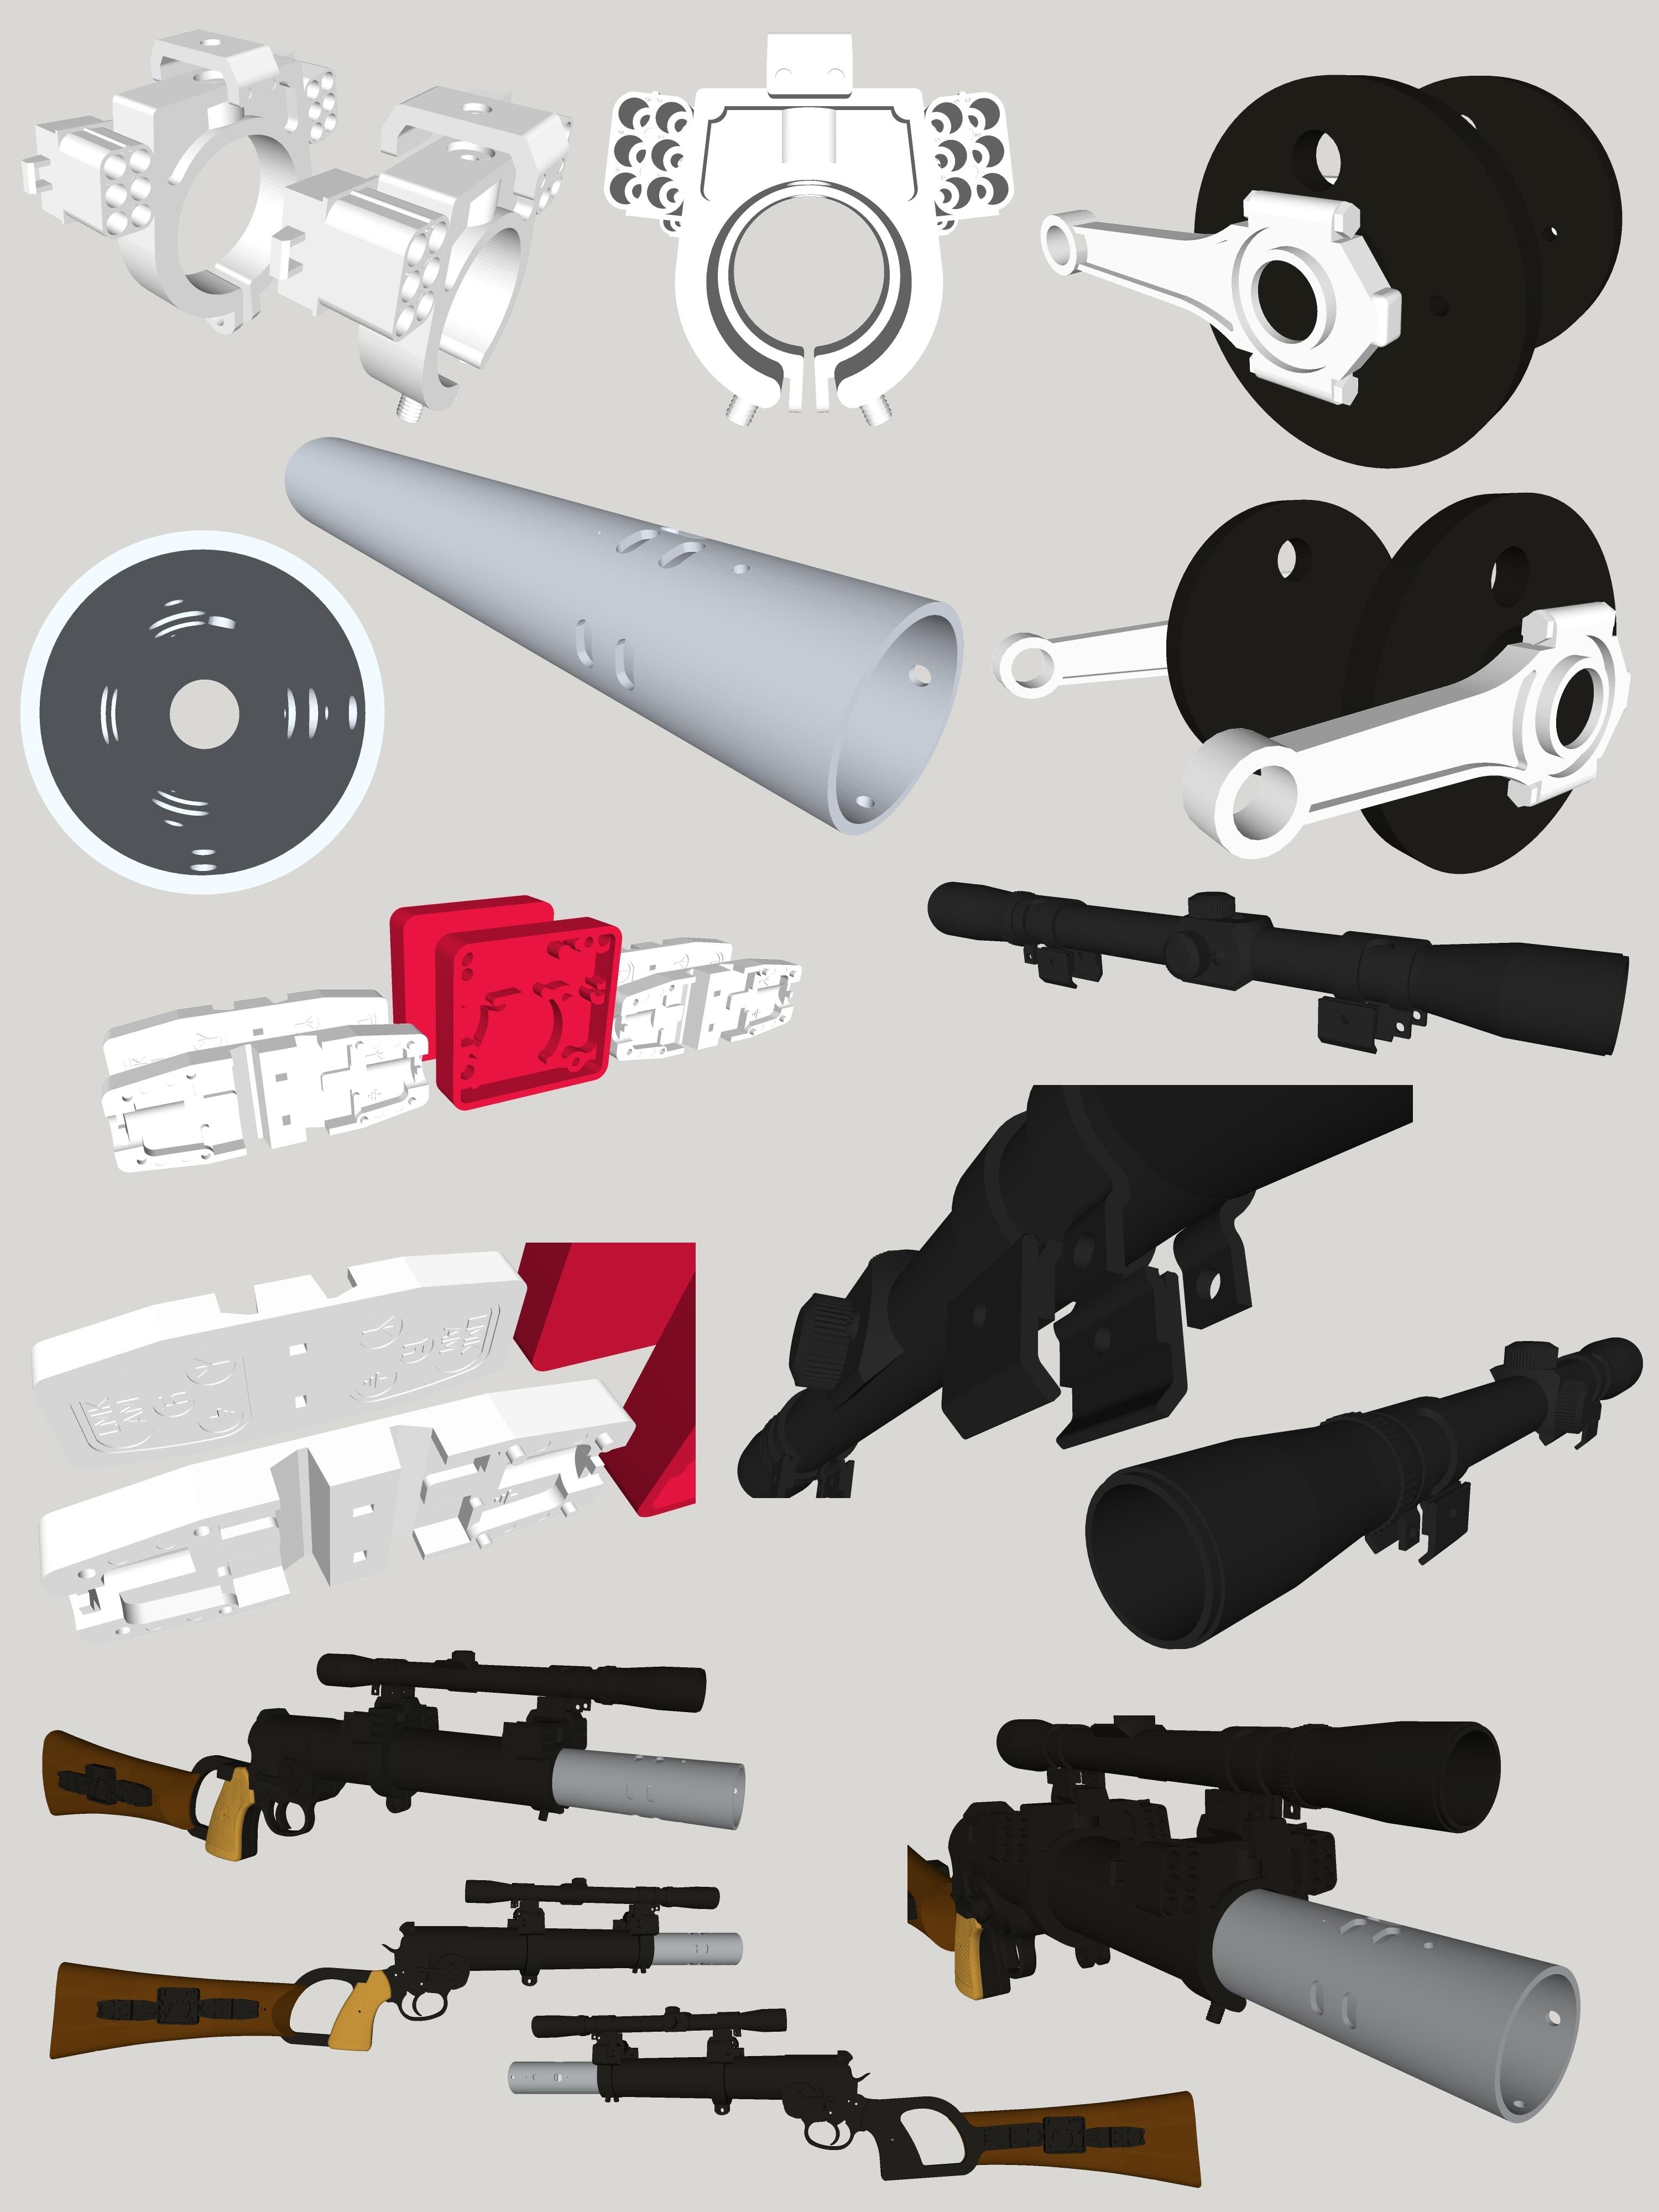 ESB EE-3 Blaster Parts.jpg